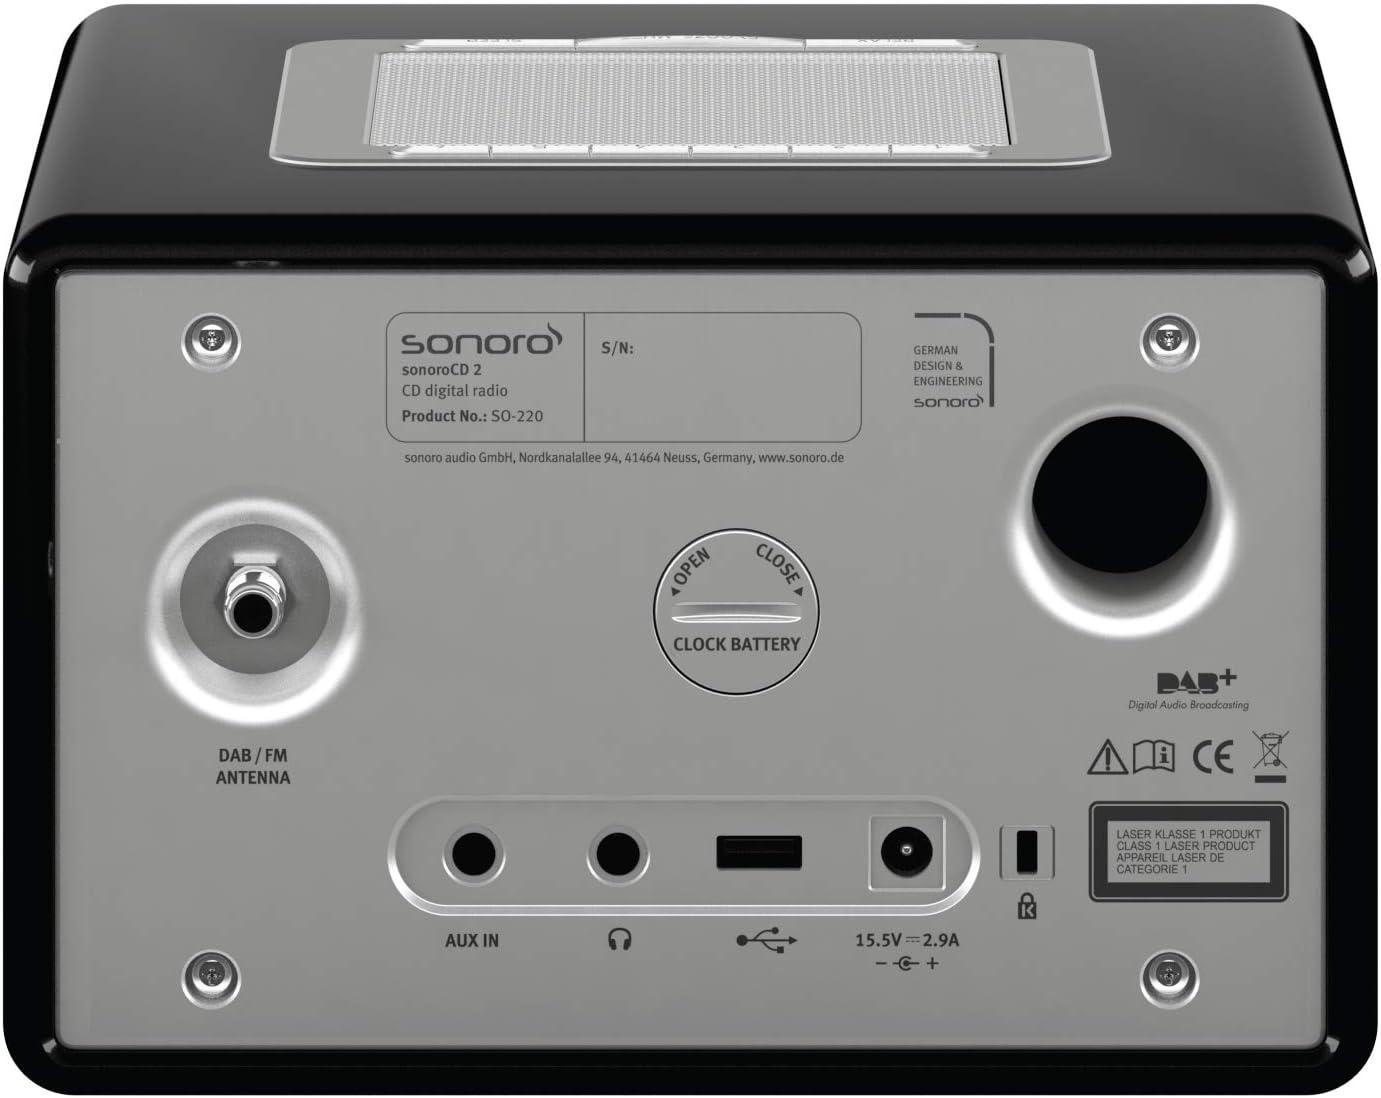 Sonoro Cd2 Schwarz Elektronik